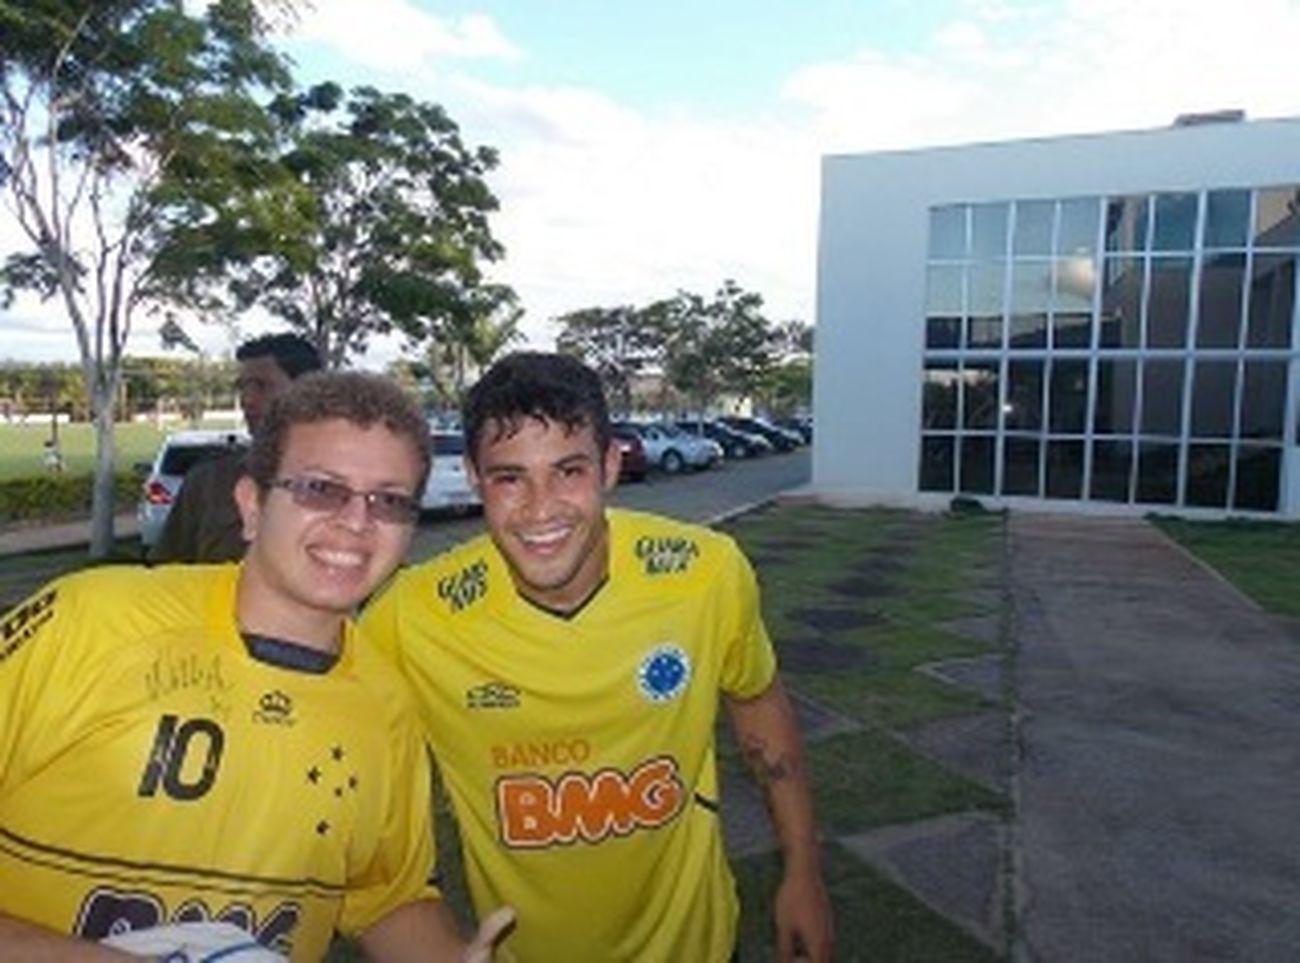 FechadoComOCruzeiro Cruzeiro Maiordeminas Enjoying Life